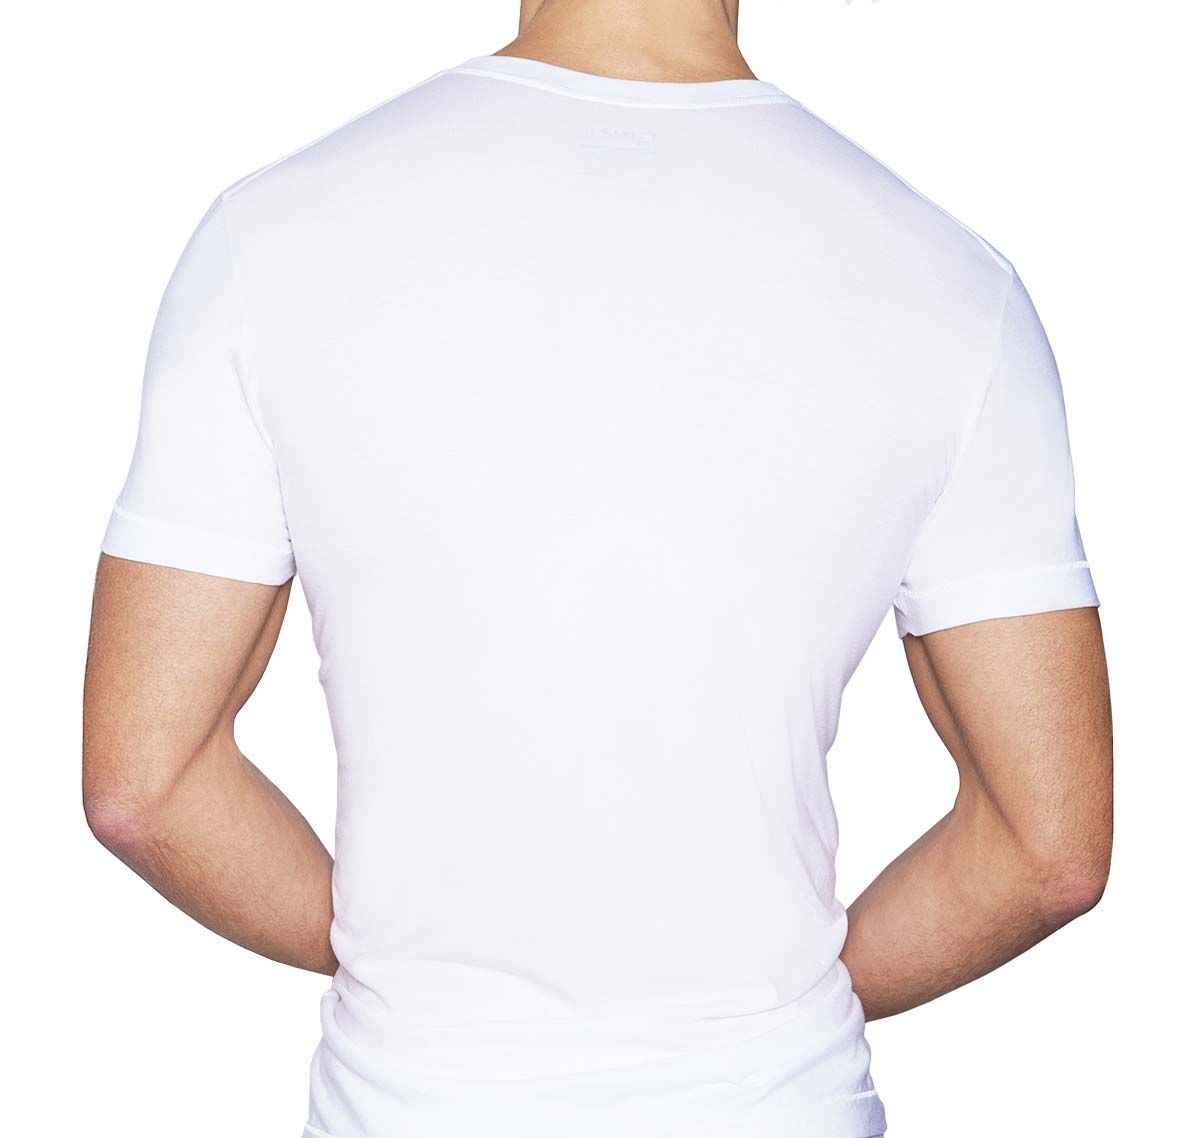 C-IN2 T-Shirt CORE DEEP V-NECK, blanc